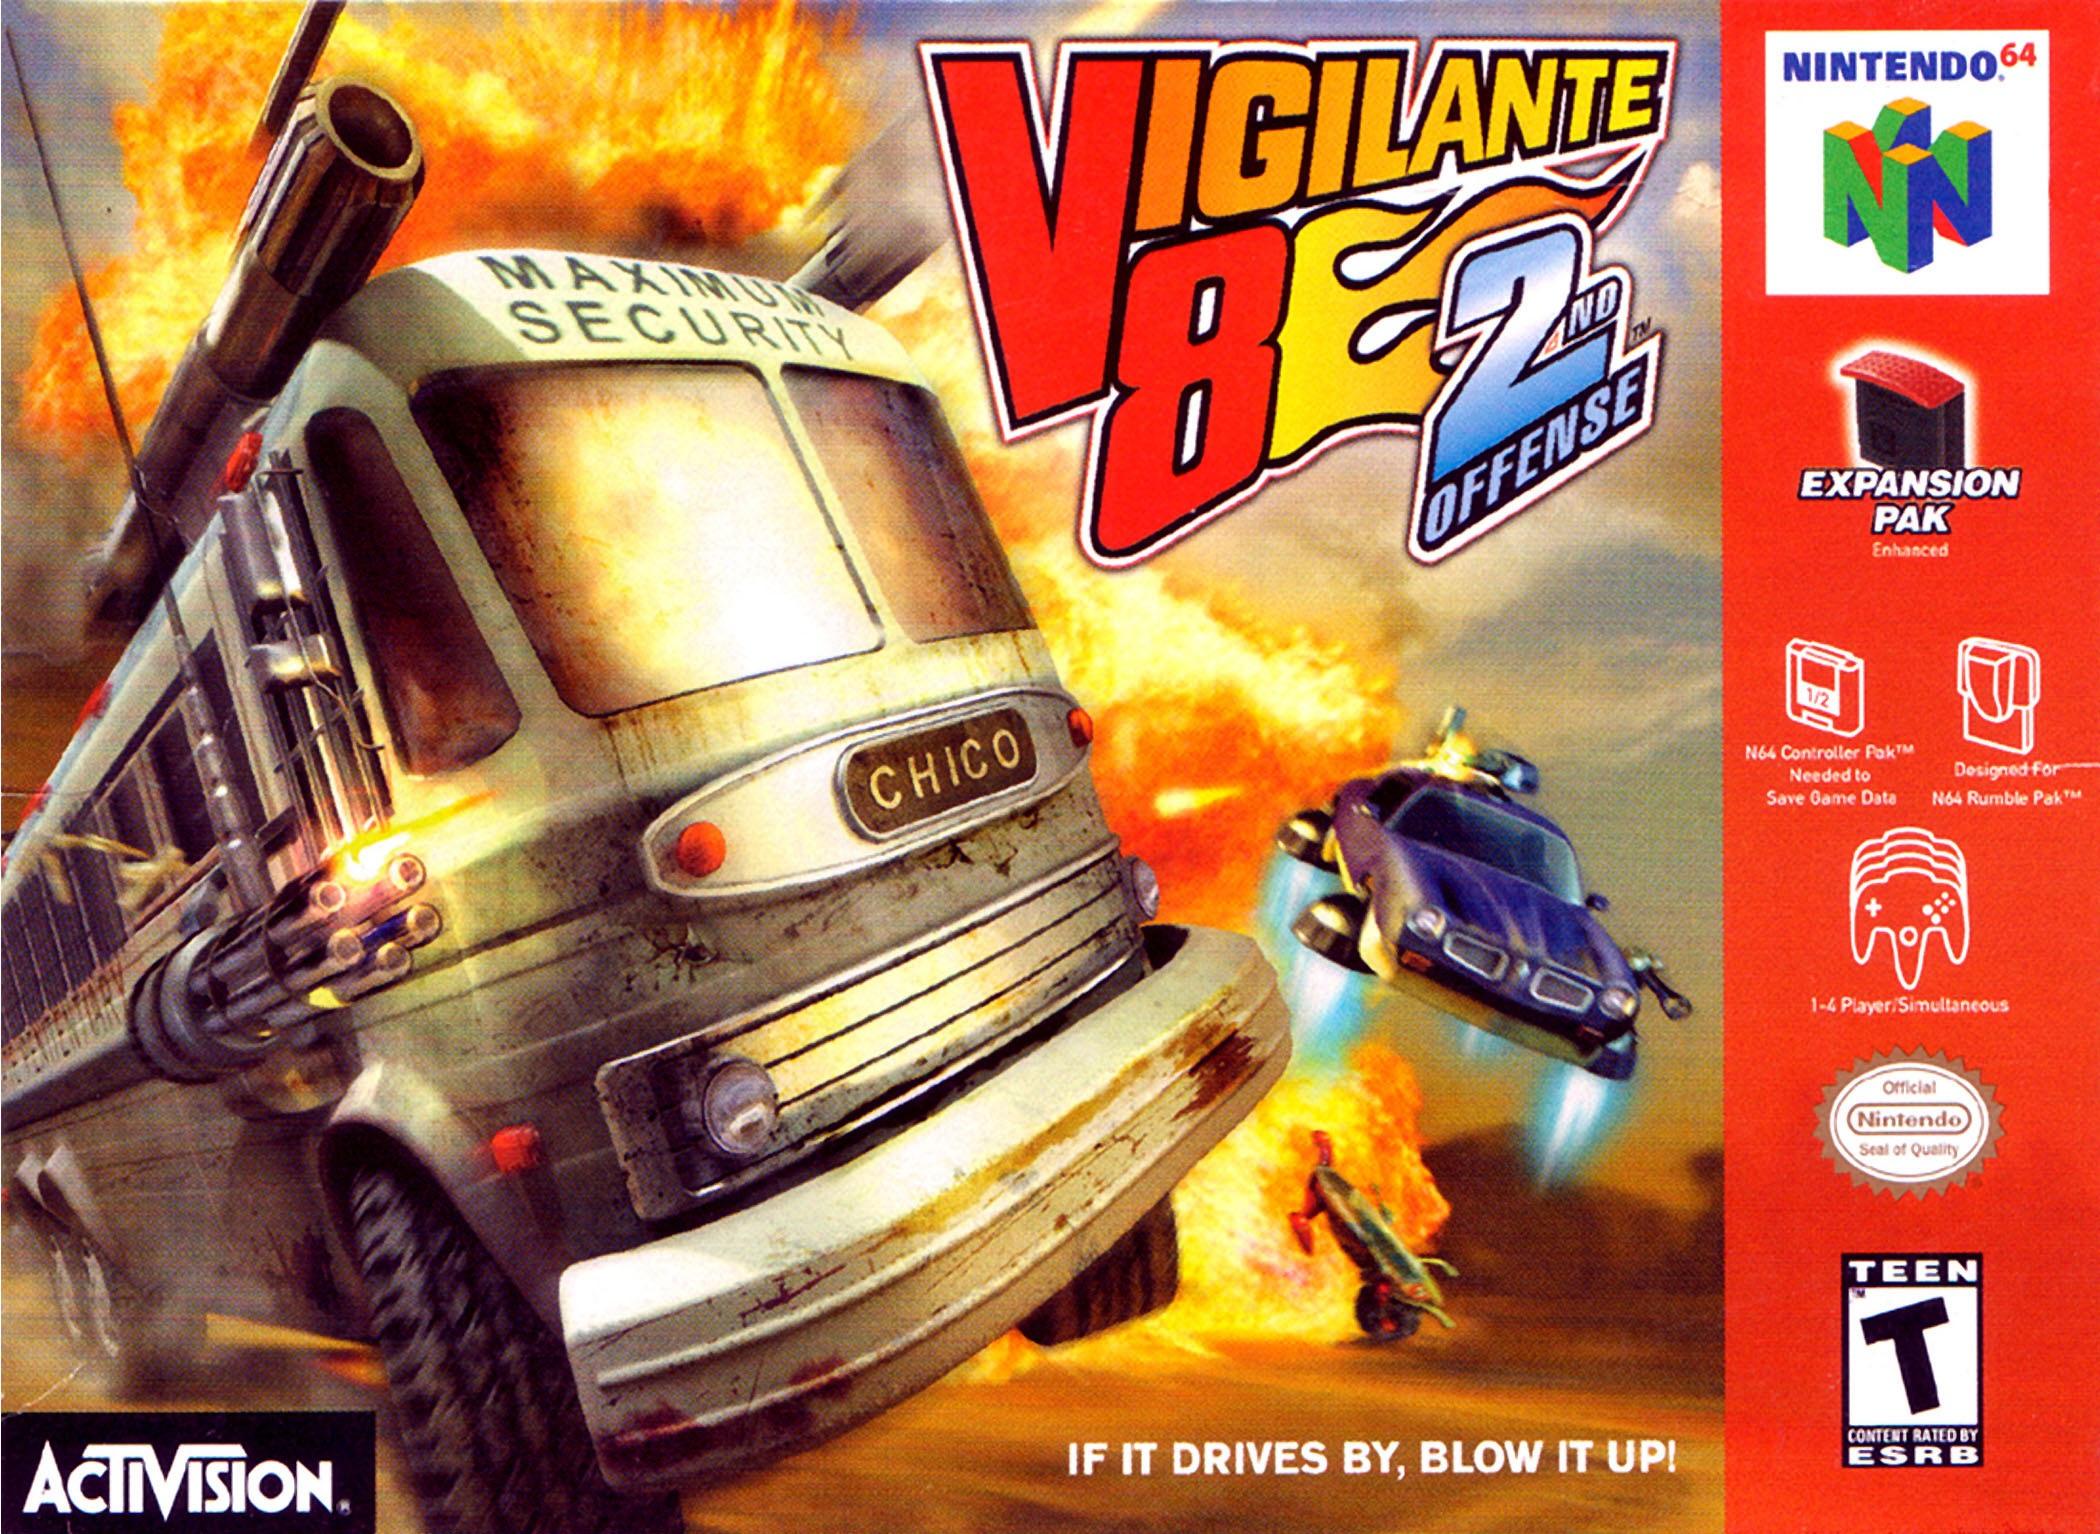 Vigilante 8: 2nd Offensehack version